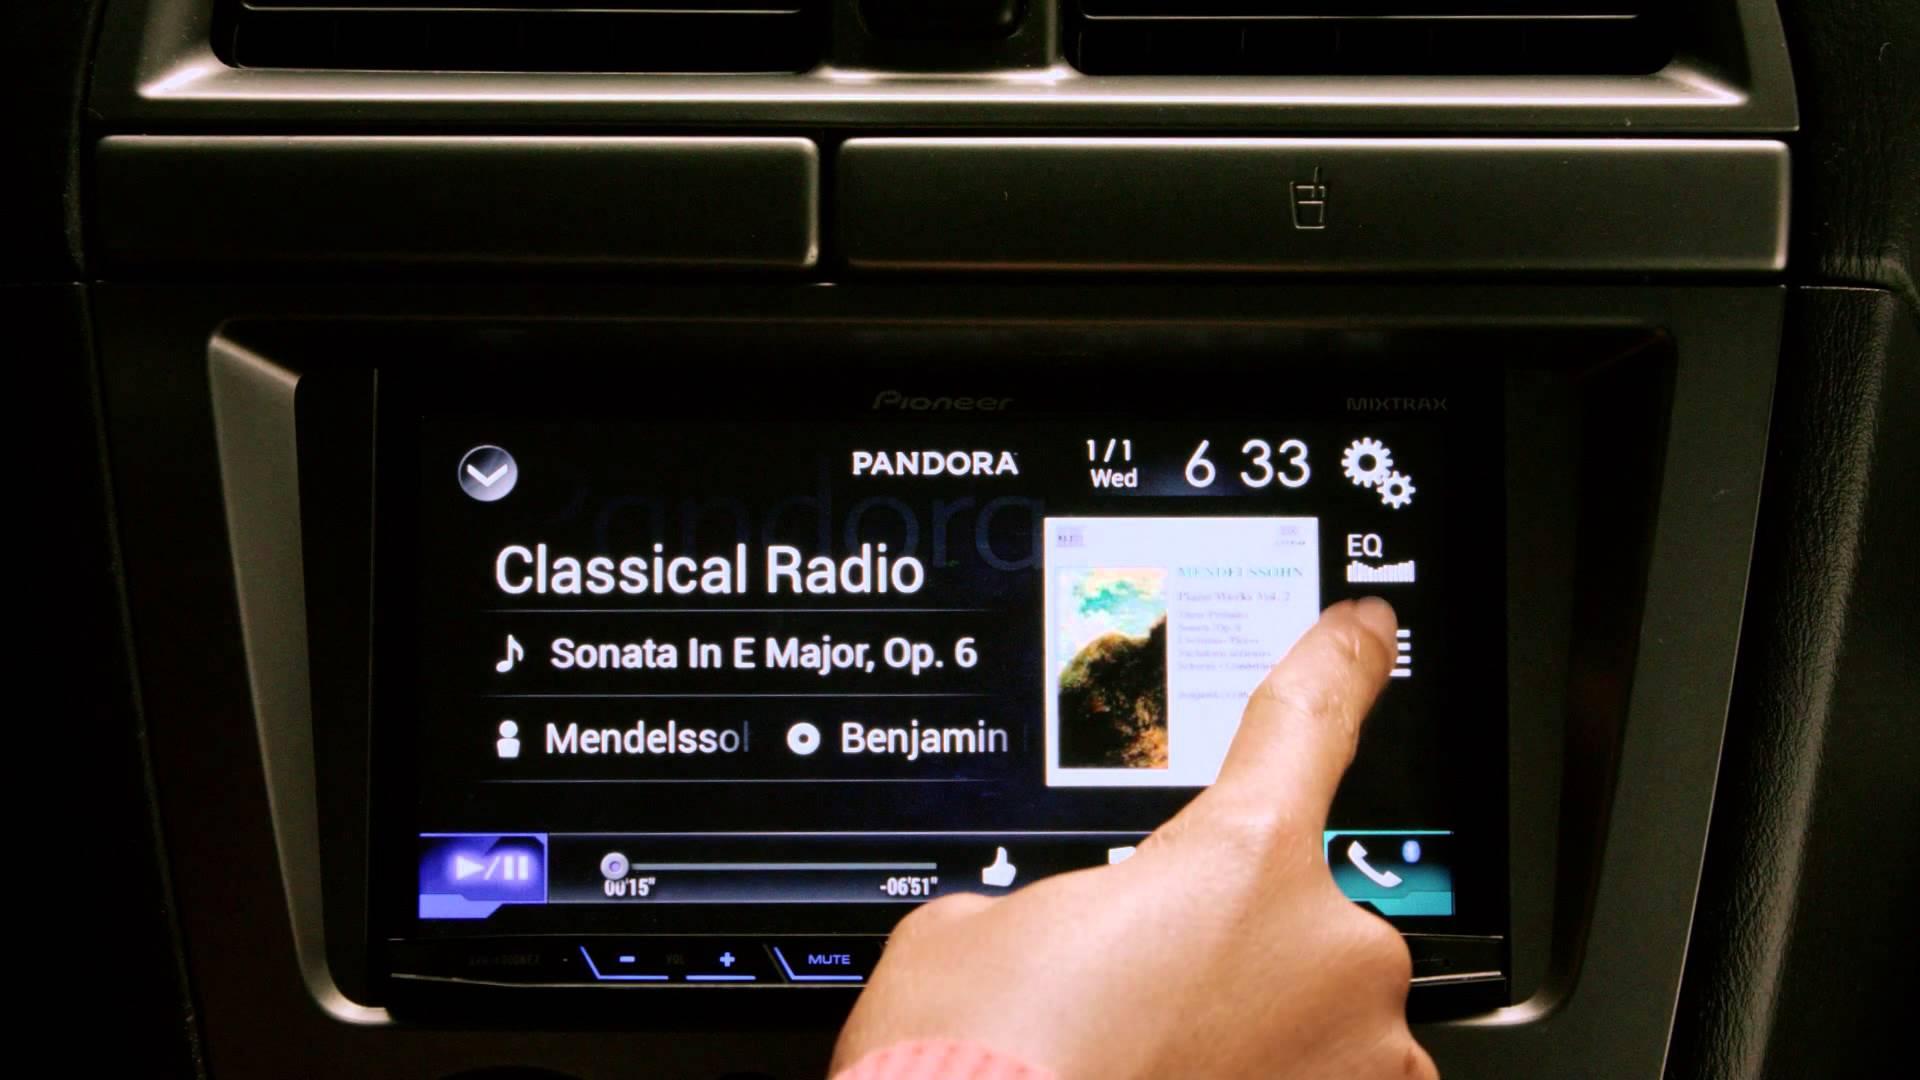 Pandora app on a car dashboard.